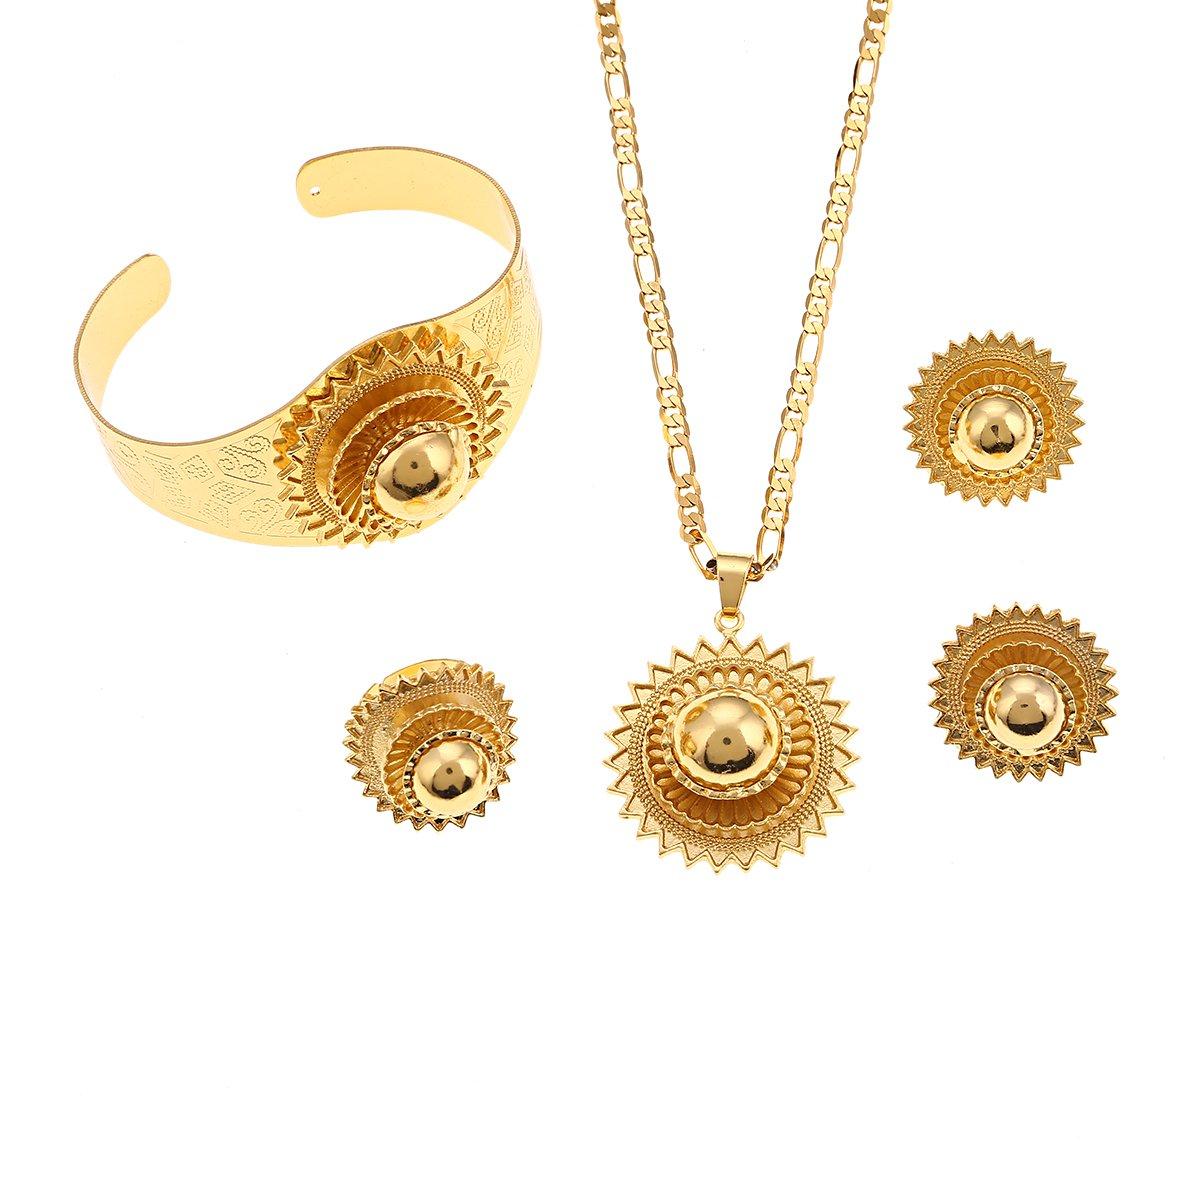 Ethiopian Gold Color Sets Pendant Necklaces Earrings Bangle Ring Habesha Jewelry Eritrean Wedding Gift